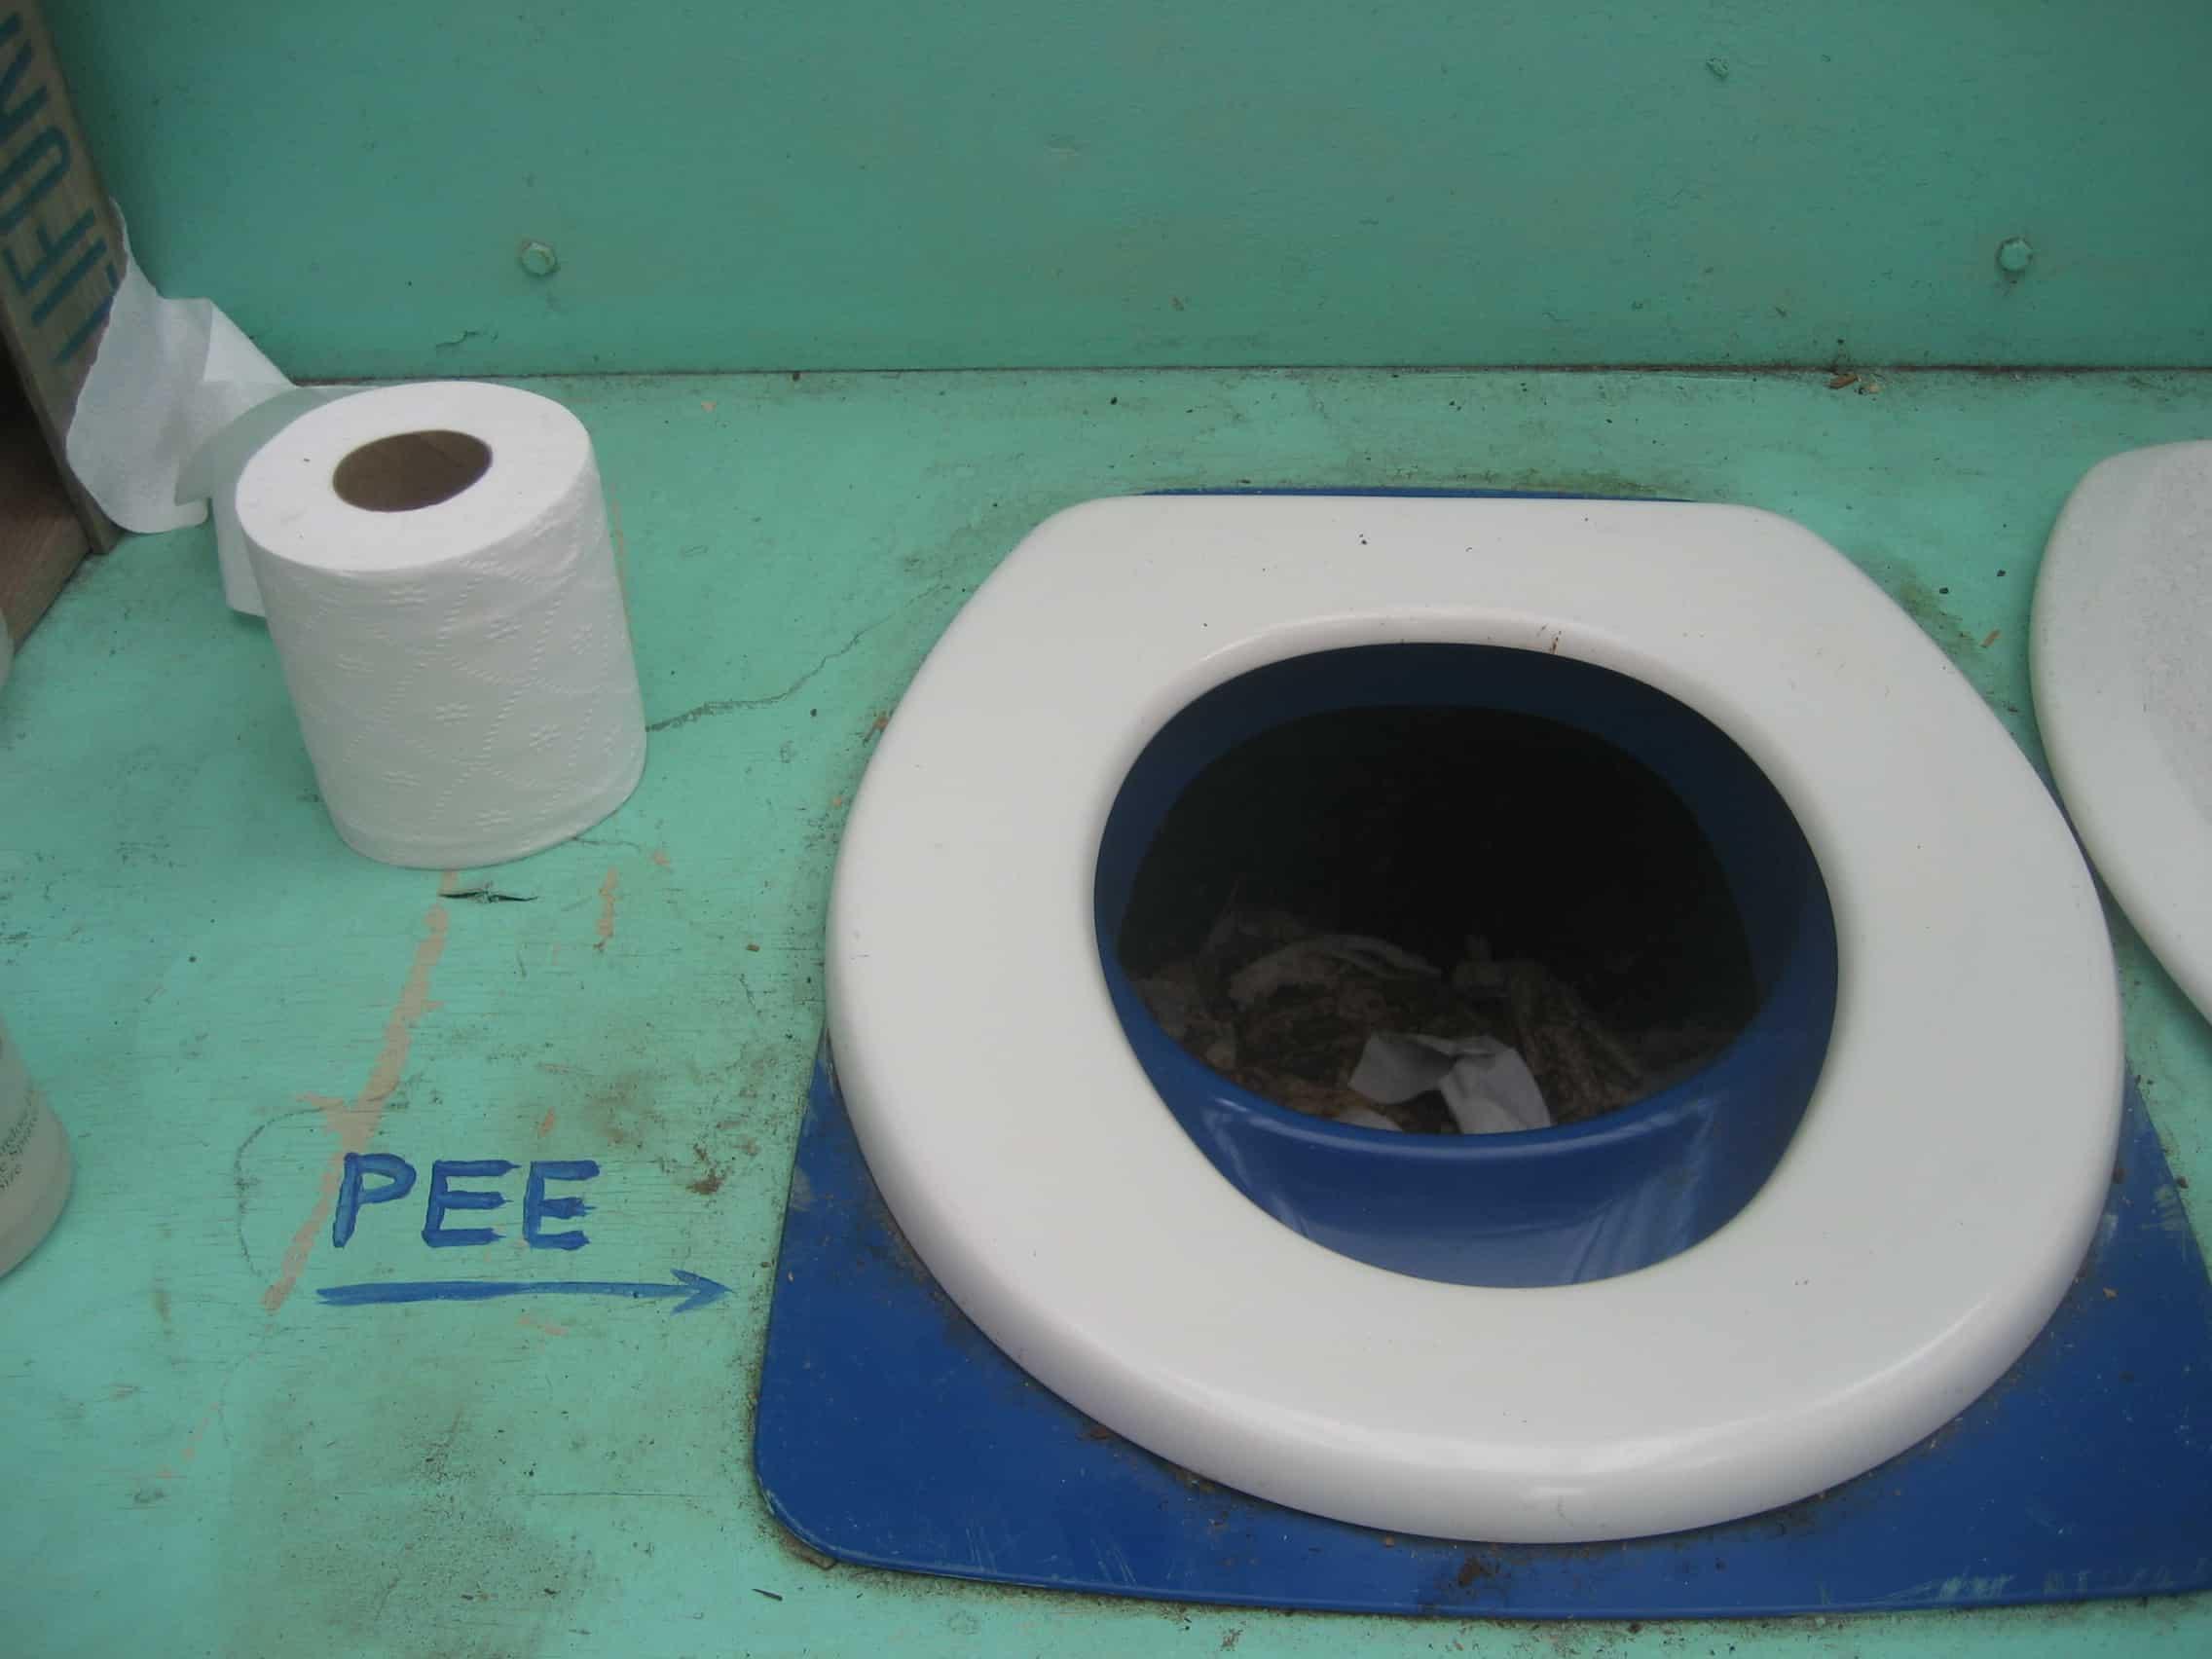 Talking Toilet Seat